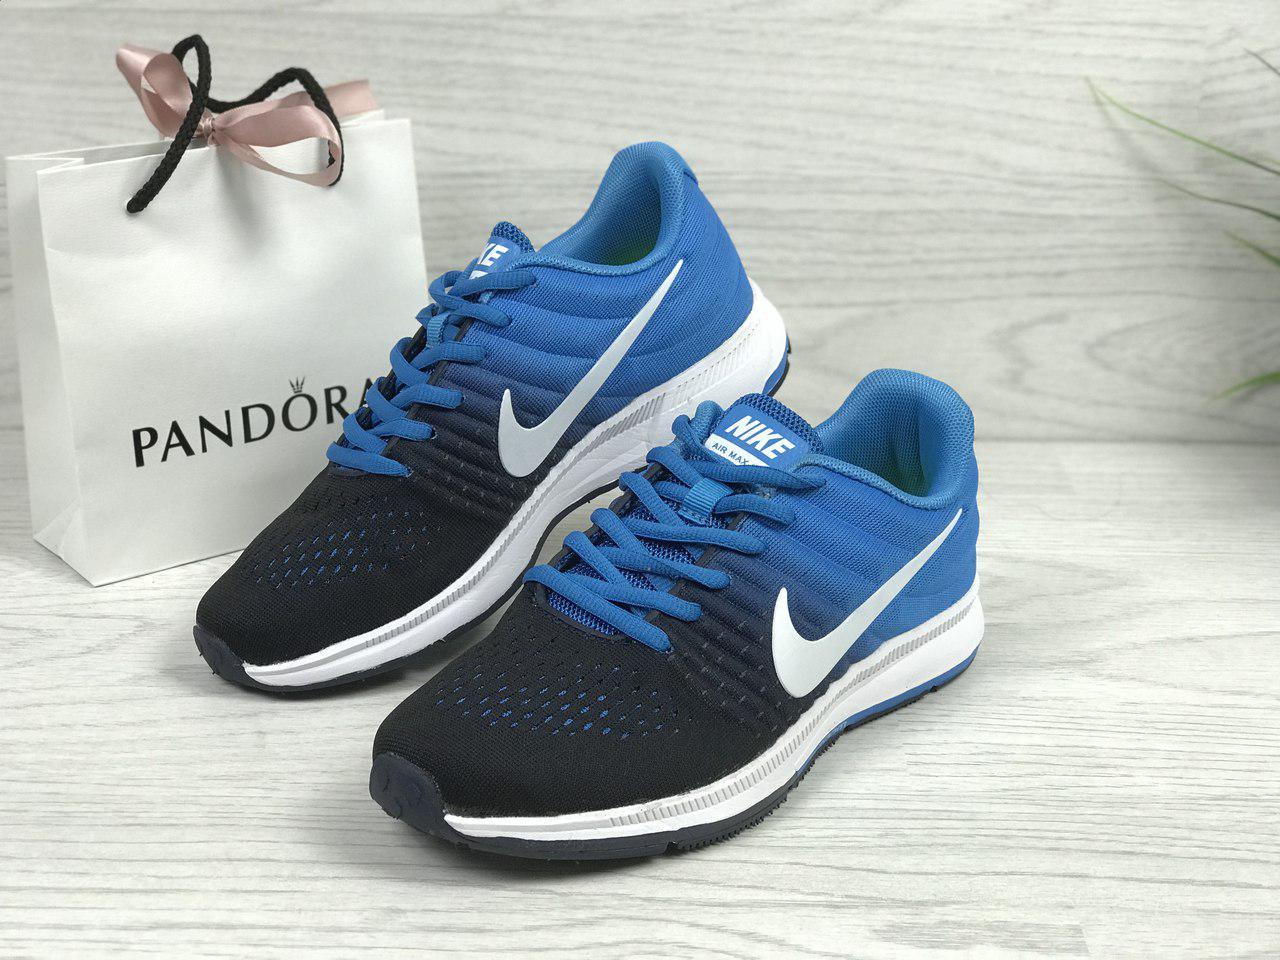 Женские кроссовки Nike Air Max  2017 (синие), ТОП-реплика